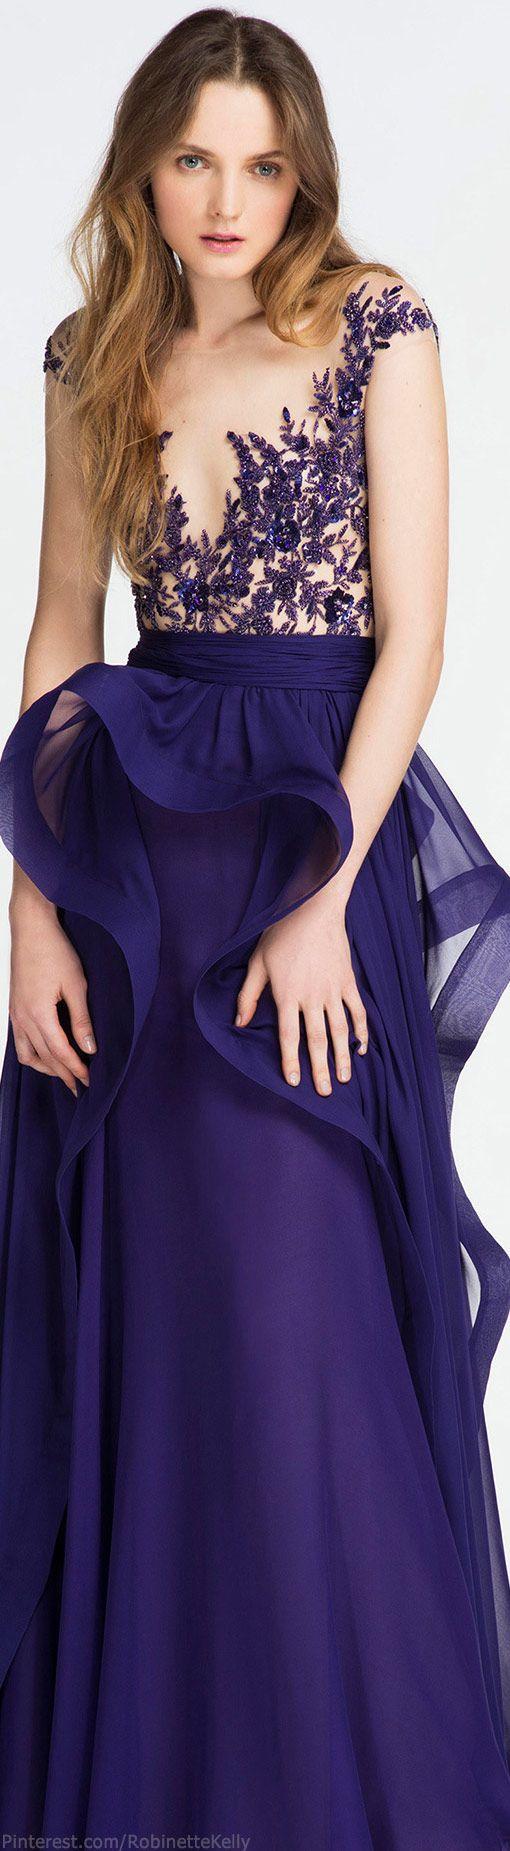 wonderfull coctail dress